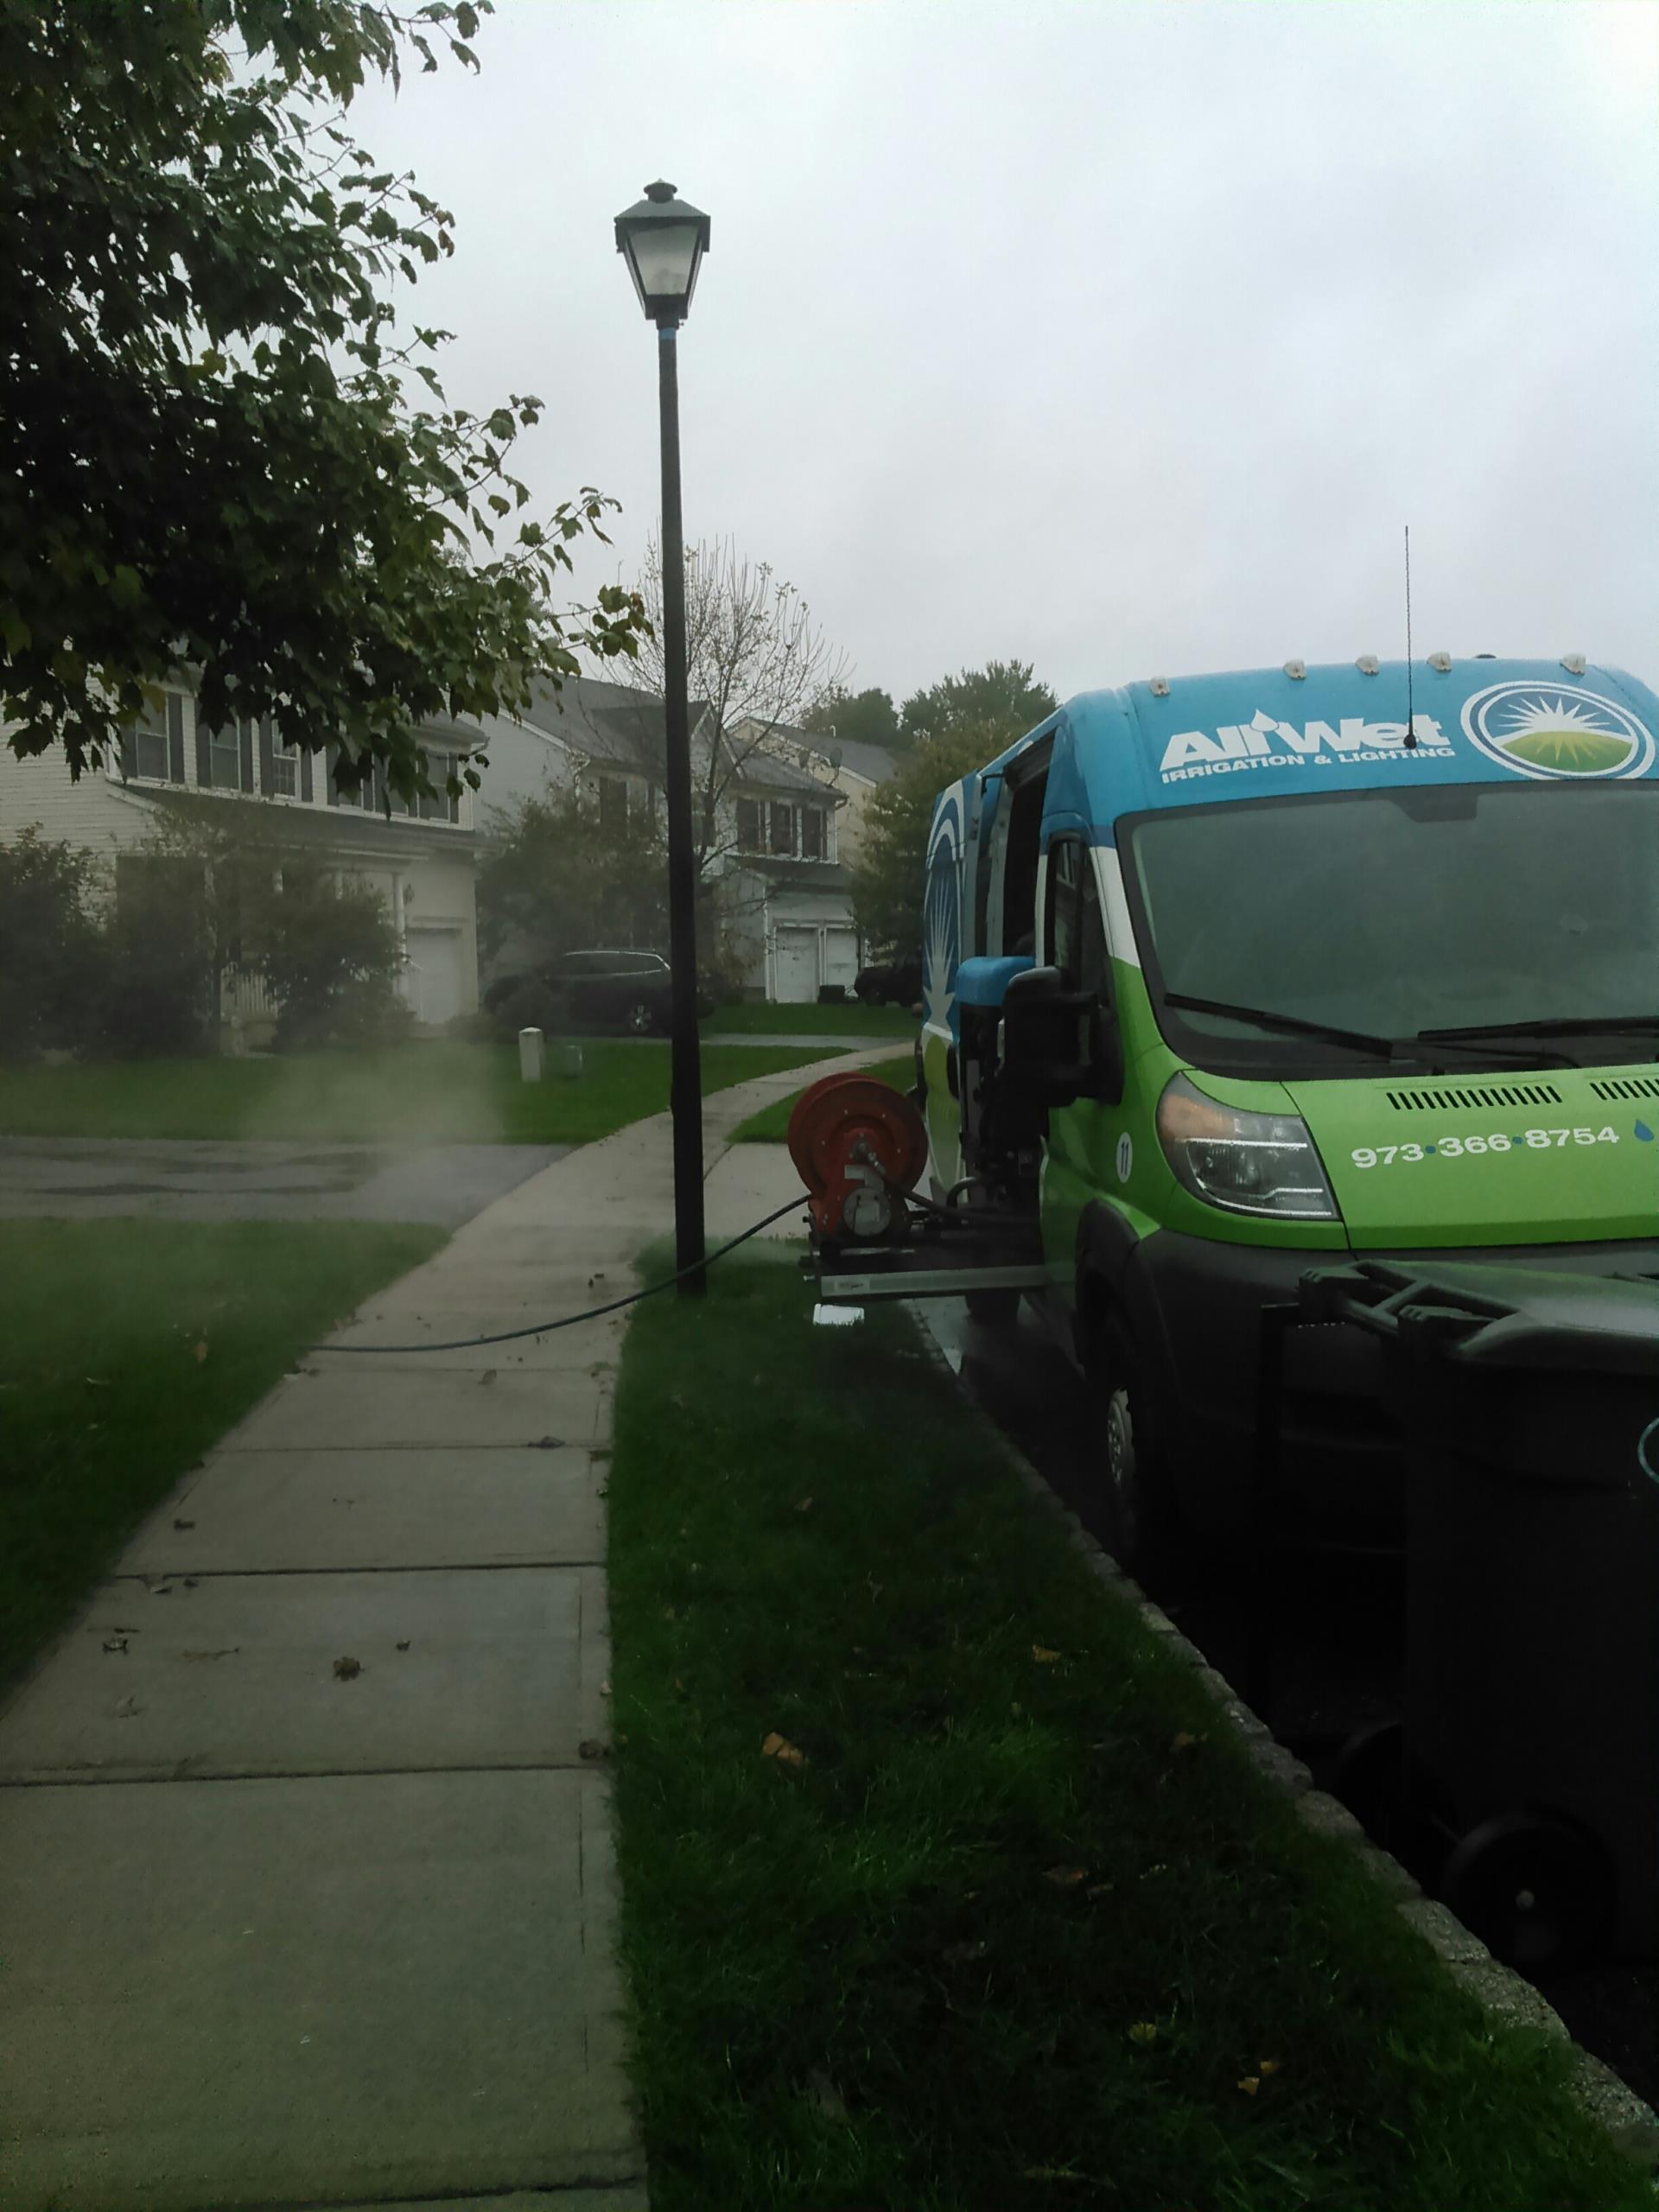 Washington Township, NJ - Lawn sprinkler irrigation system winterization